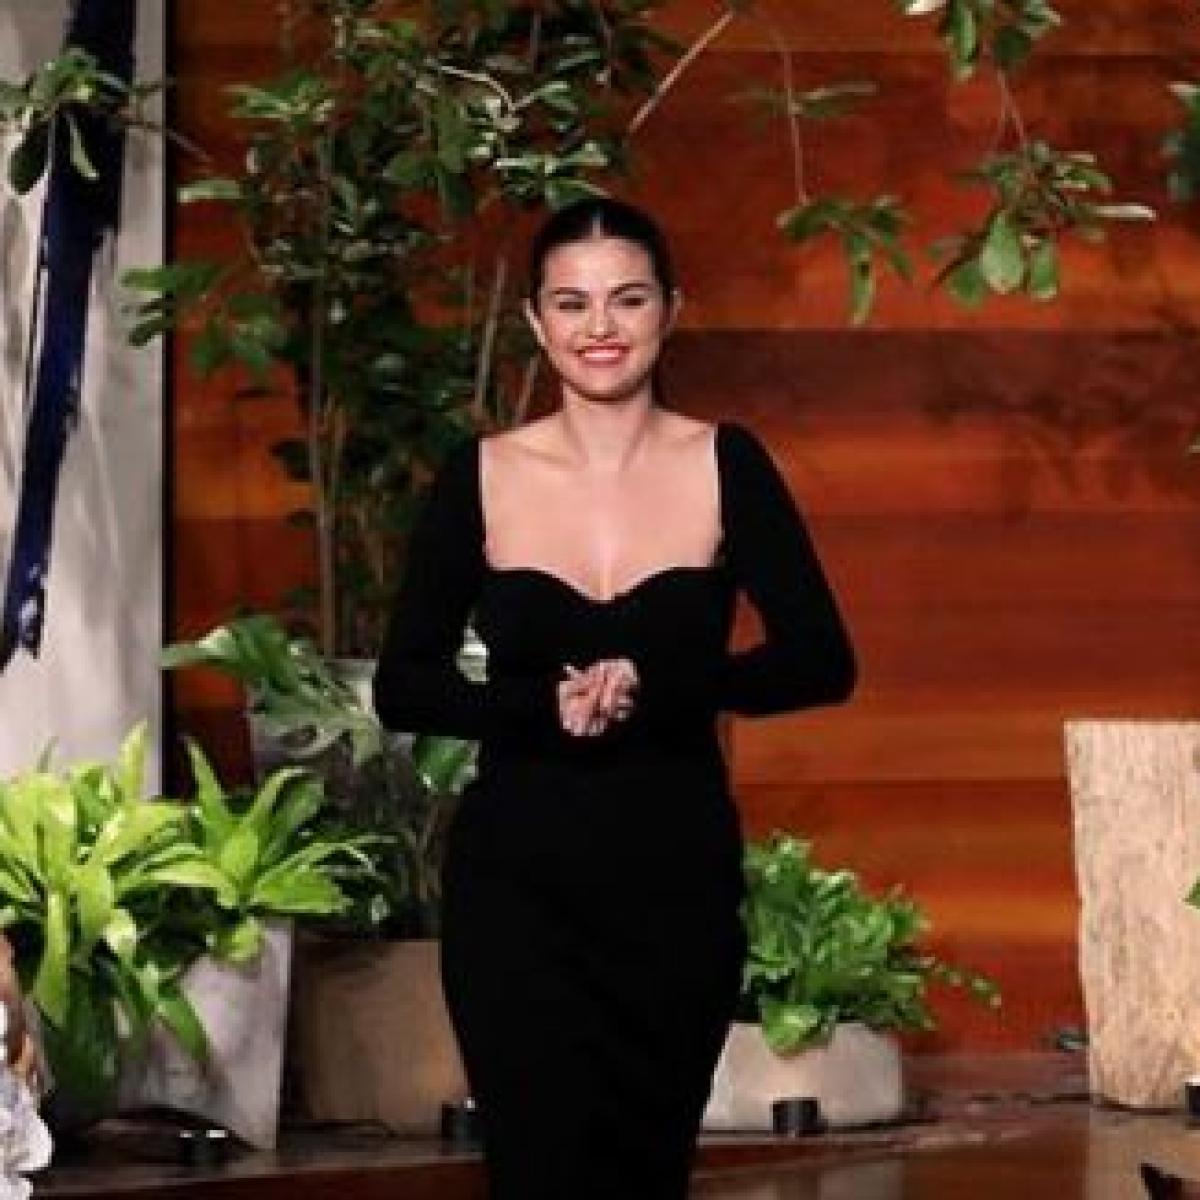 Selena Gomez to give part of album sales to coronavirus relief fund